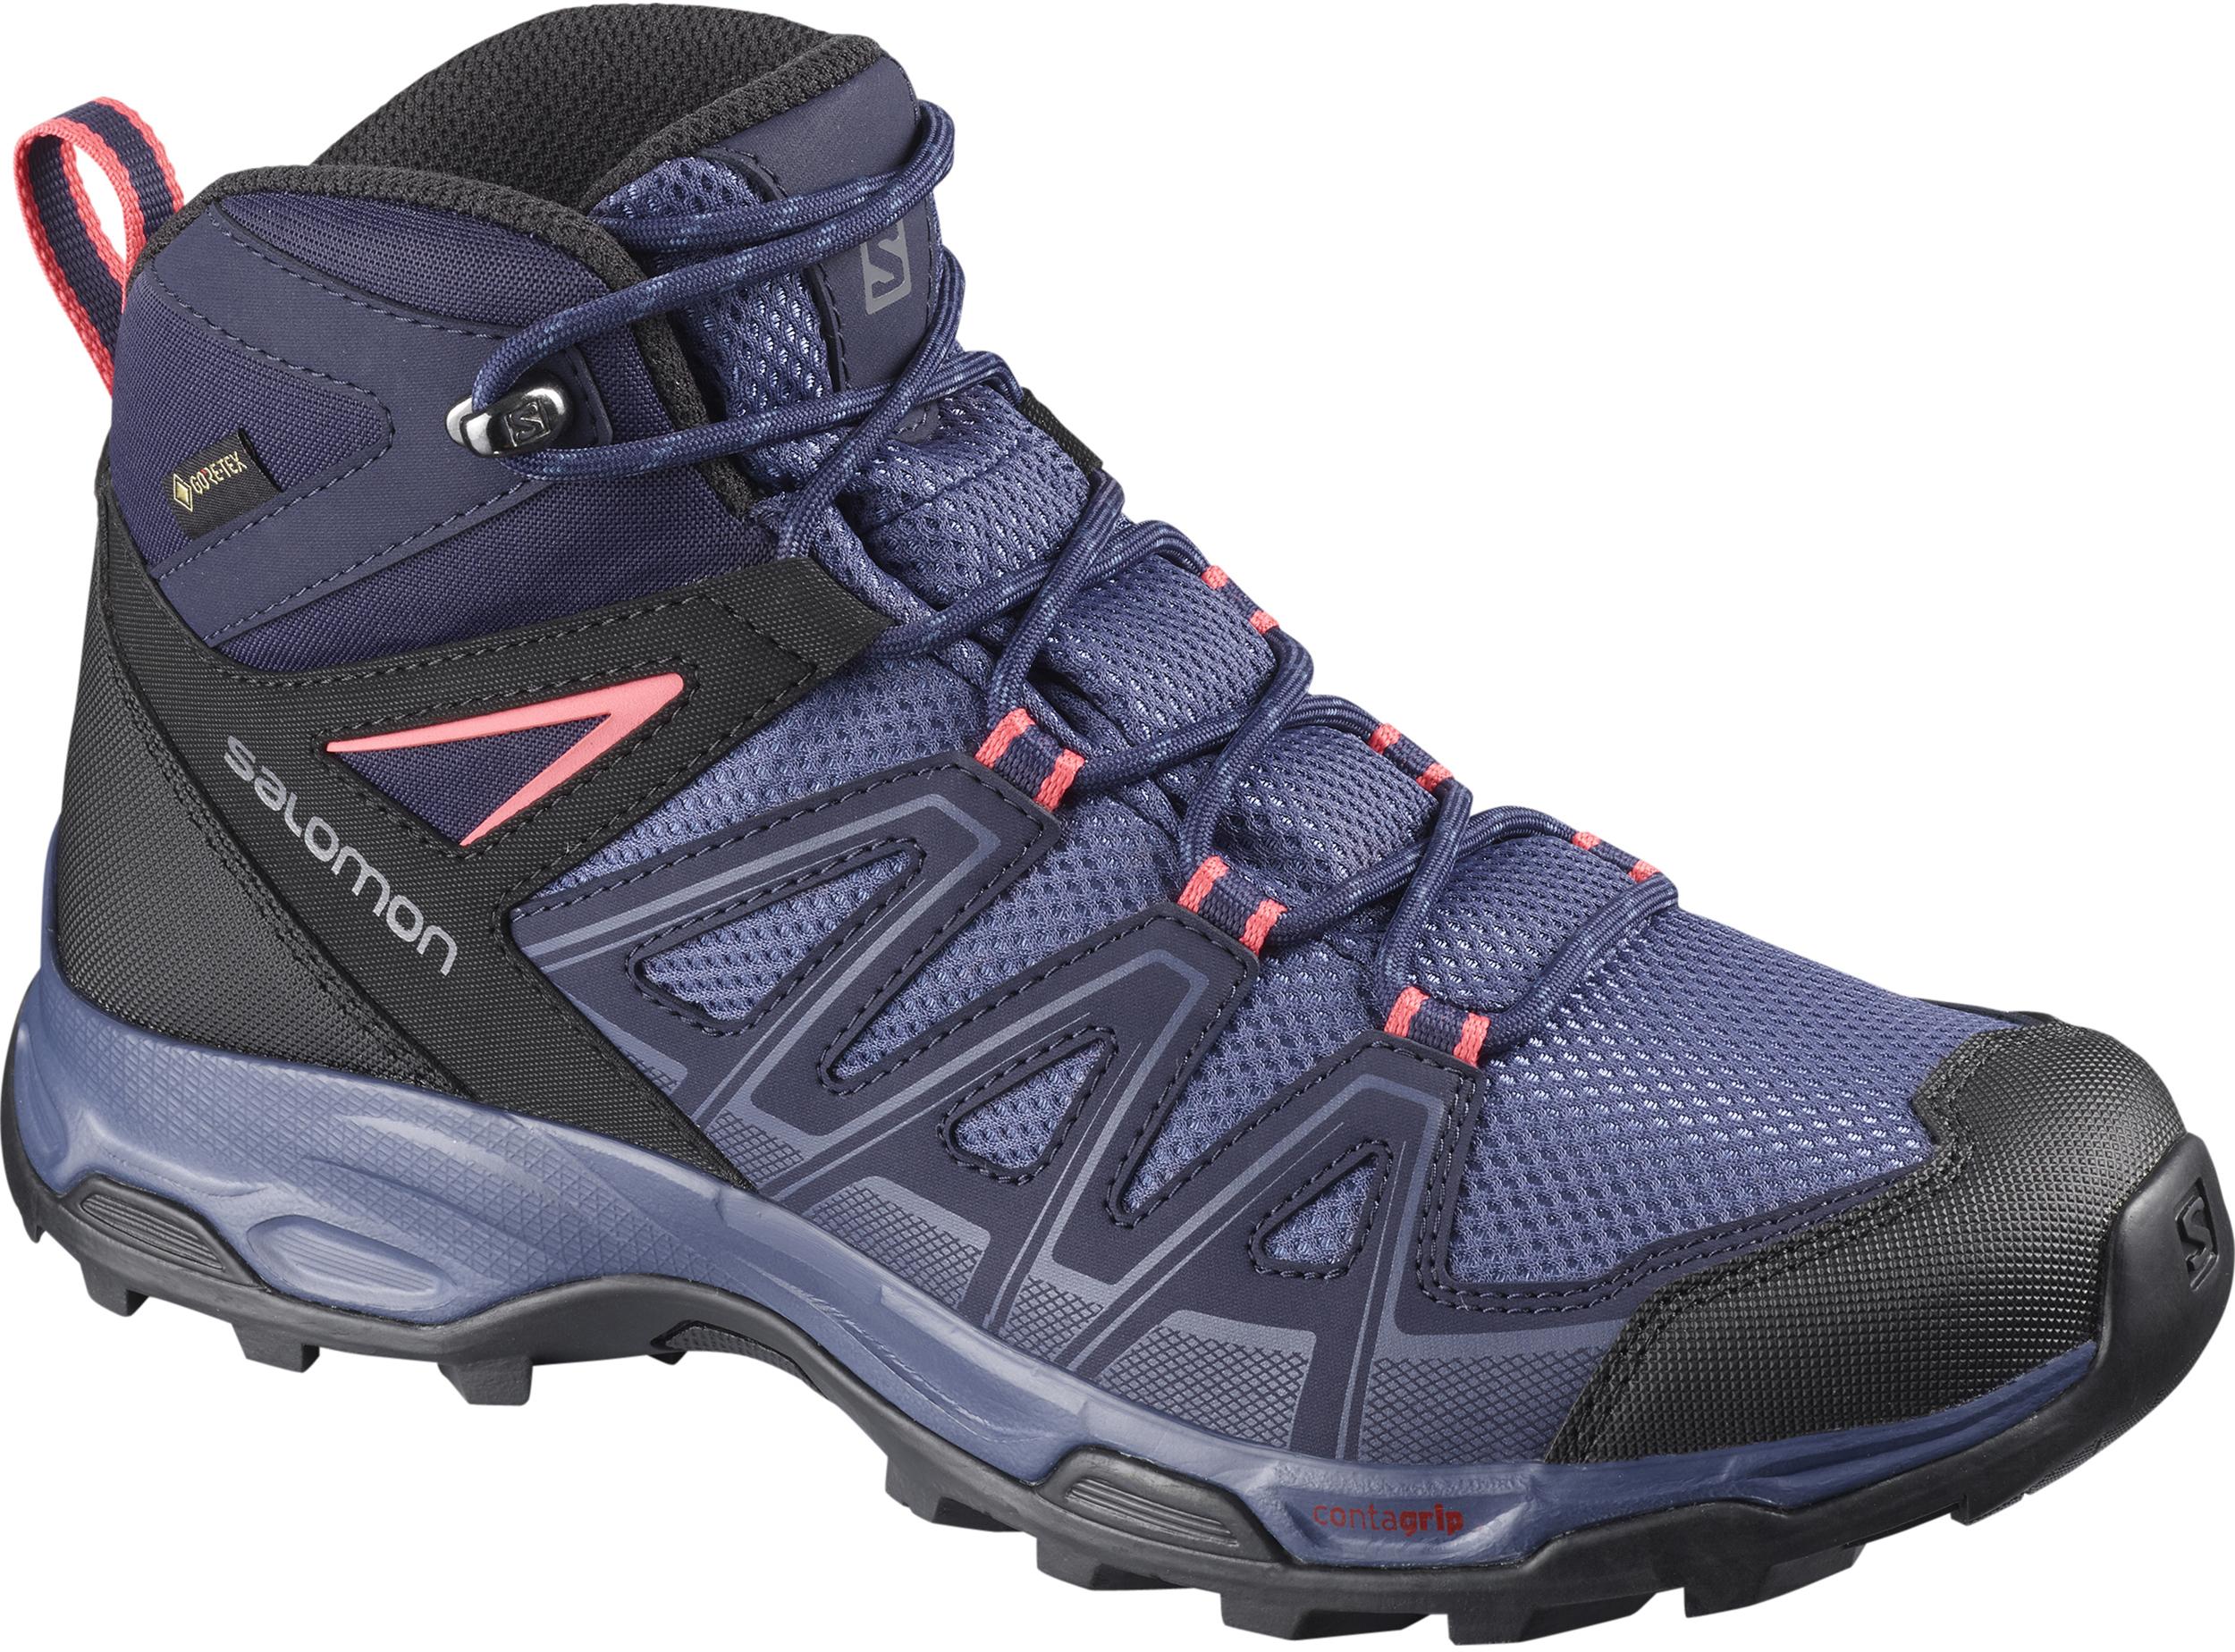 3117e52f48a Salomon Robson Mid GTX Light Hiking Boots - Women's